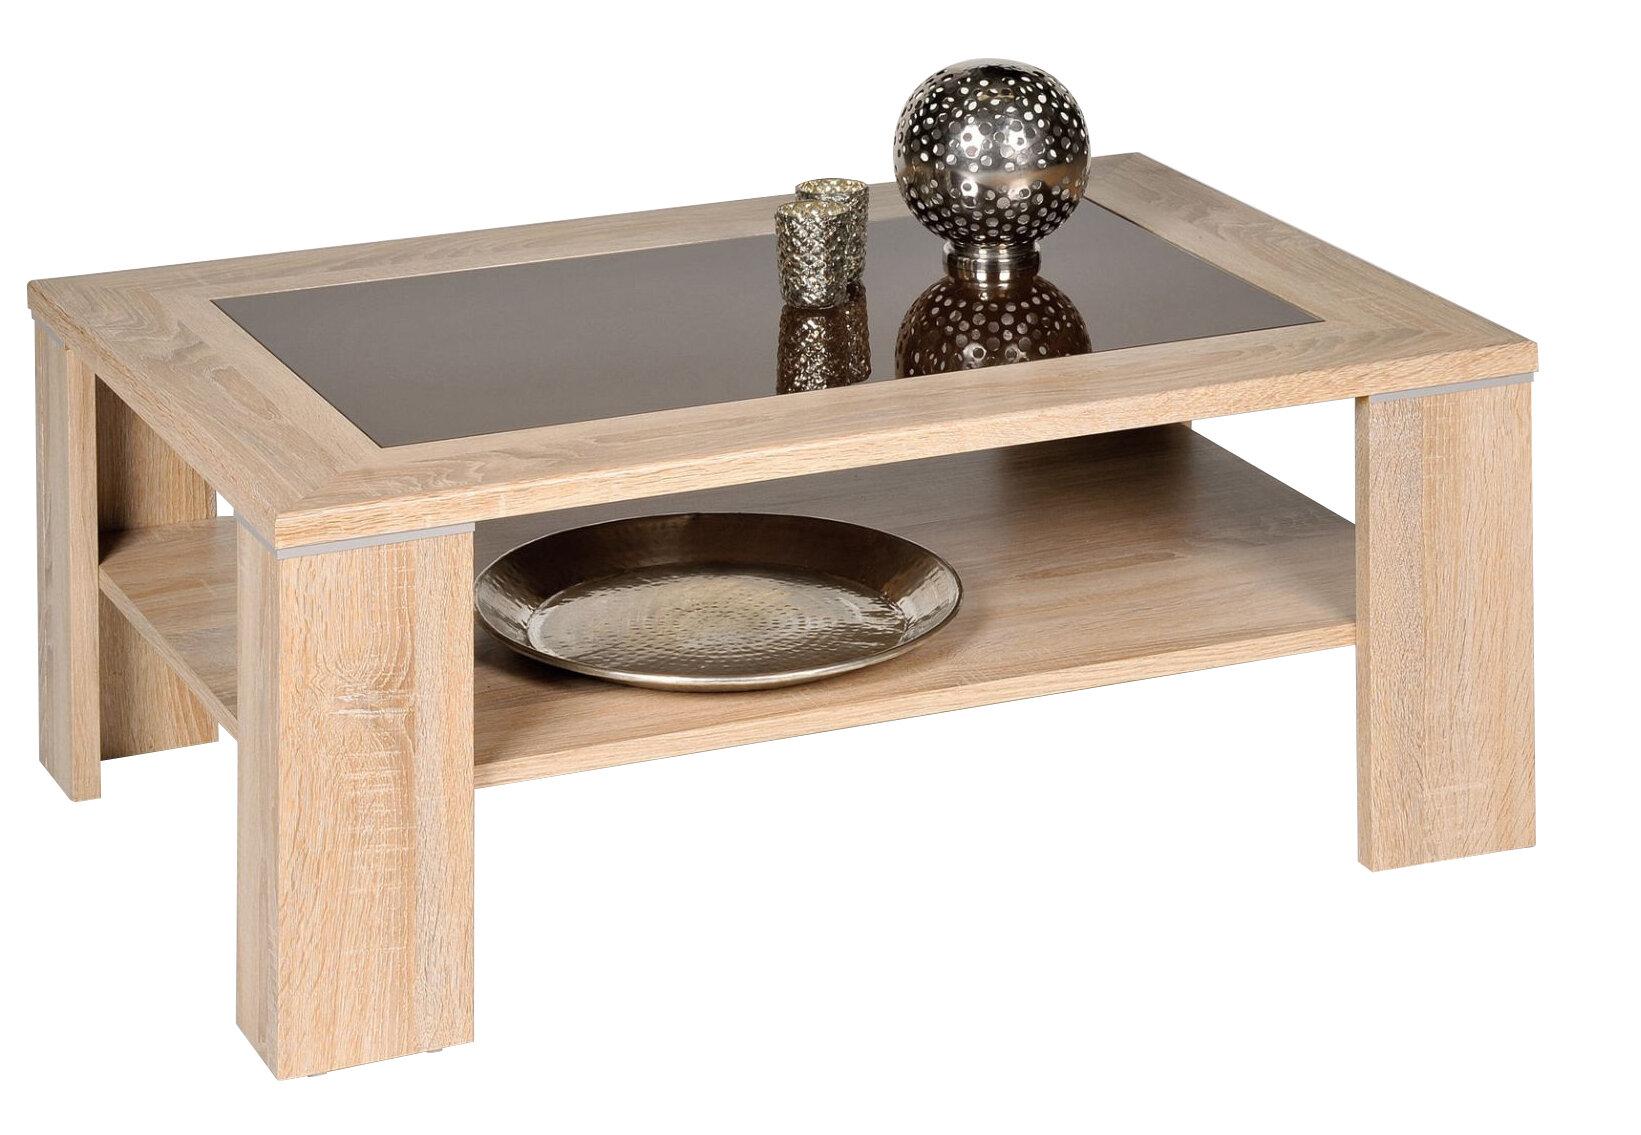 AlfaTische Santos Coffee Table With Storage Wayfaircouk - Santos coffee table